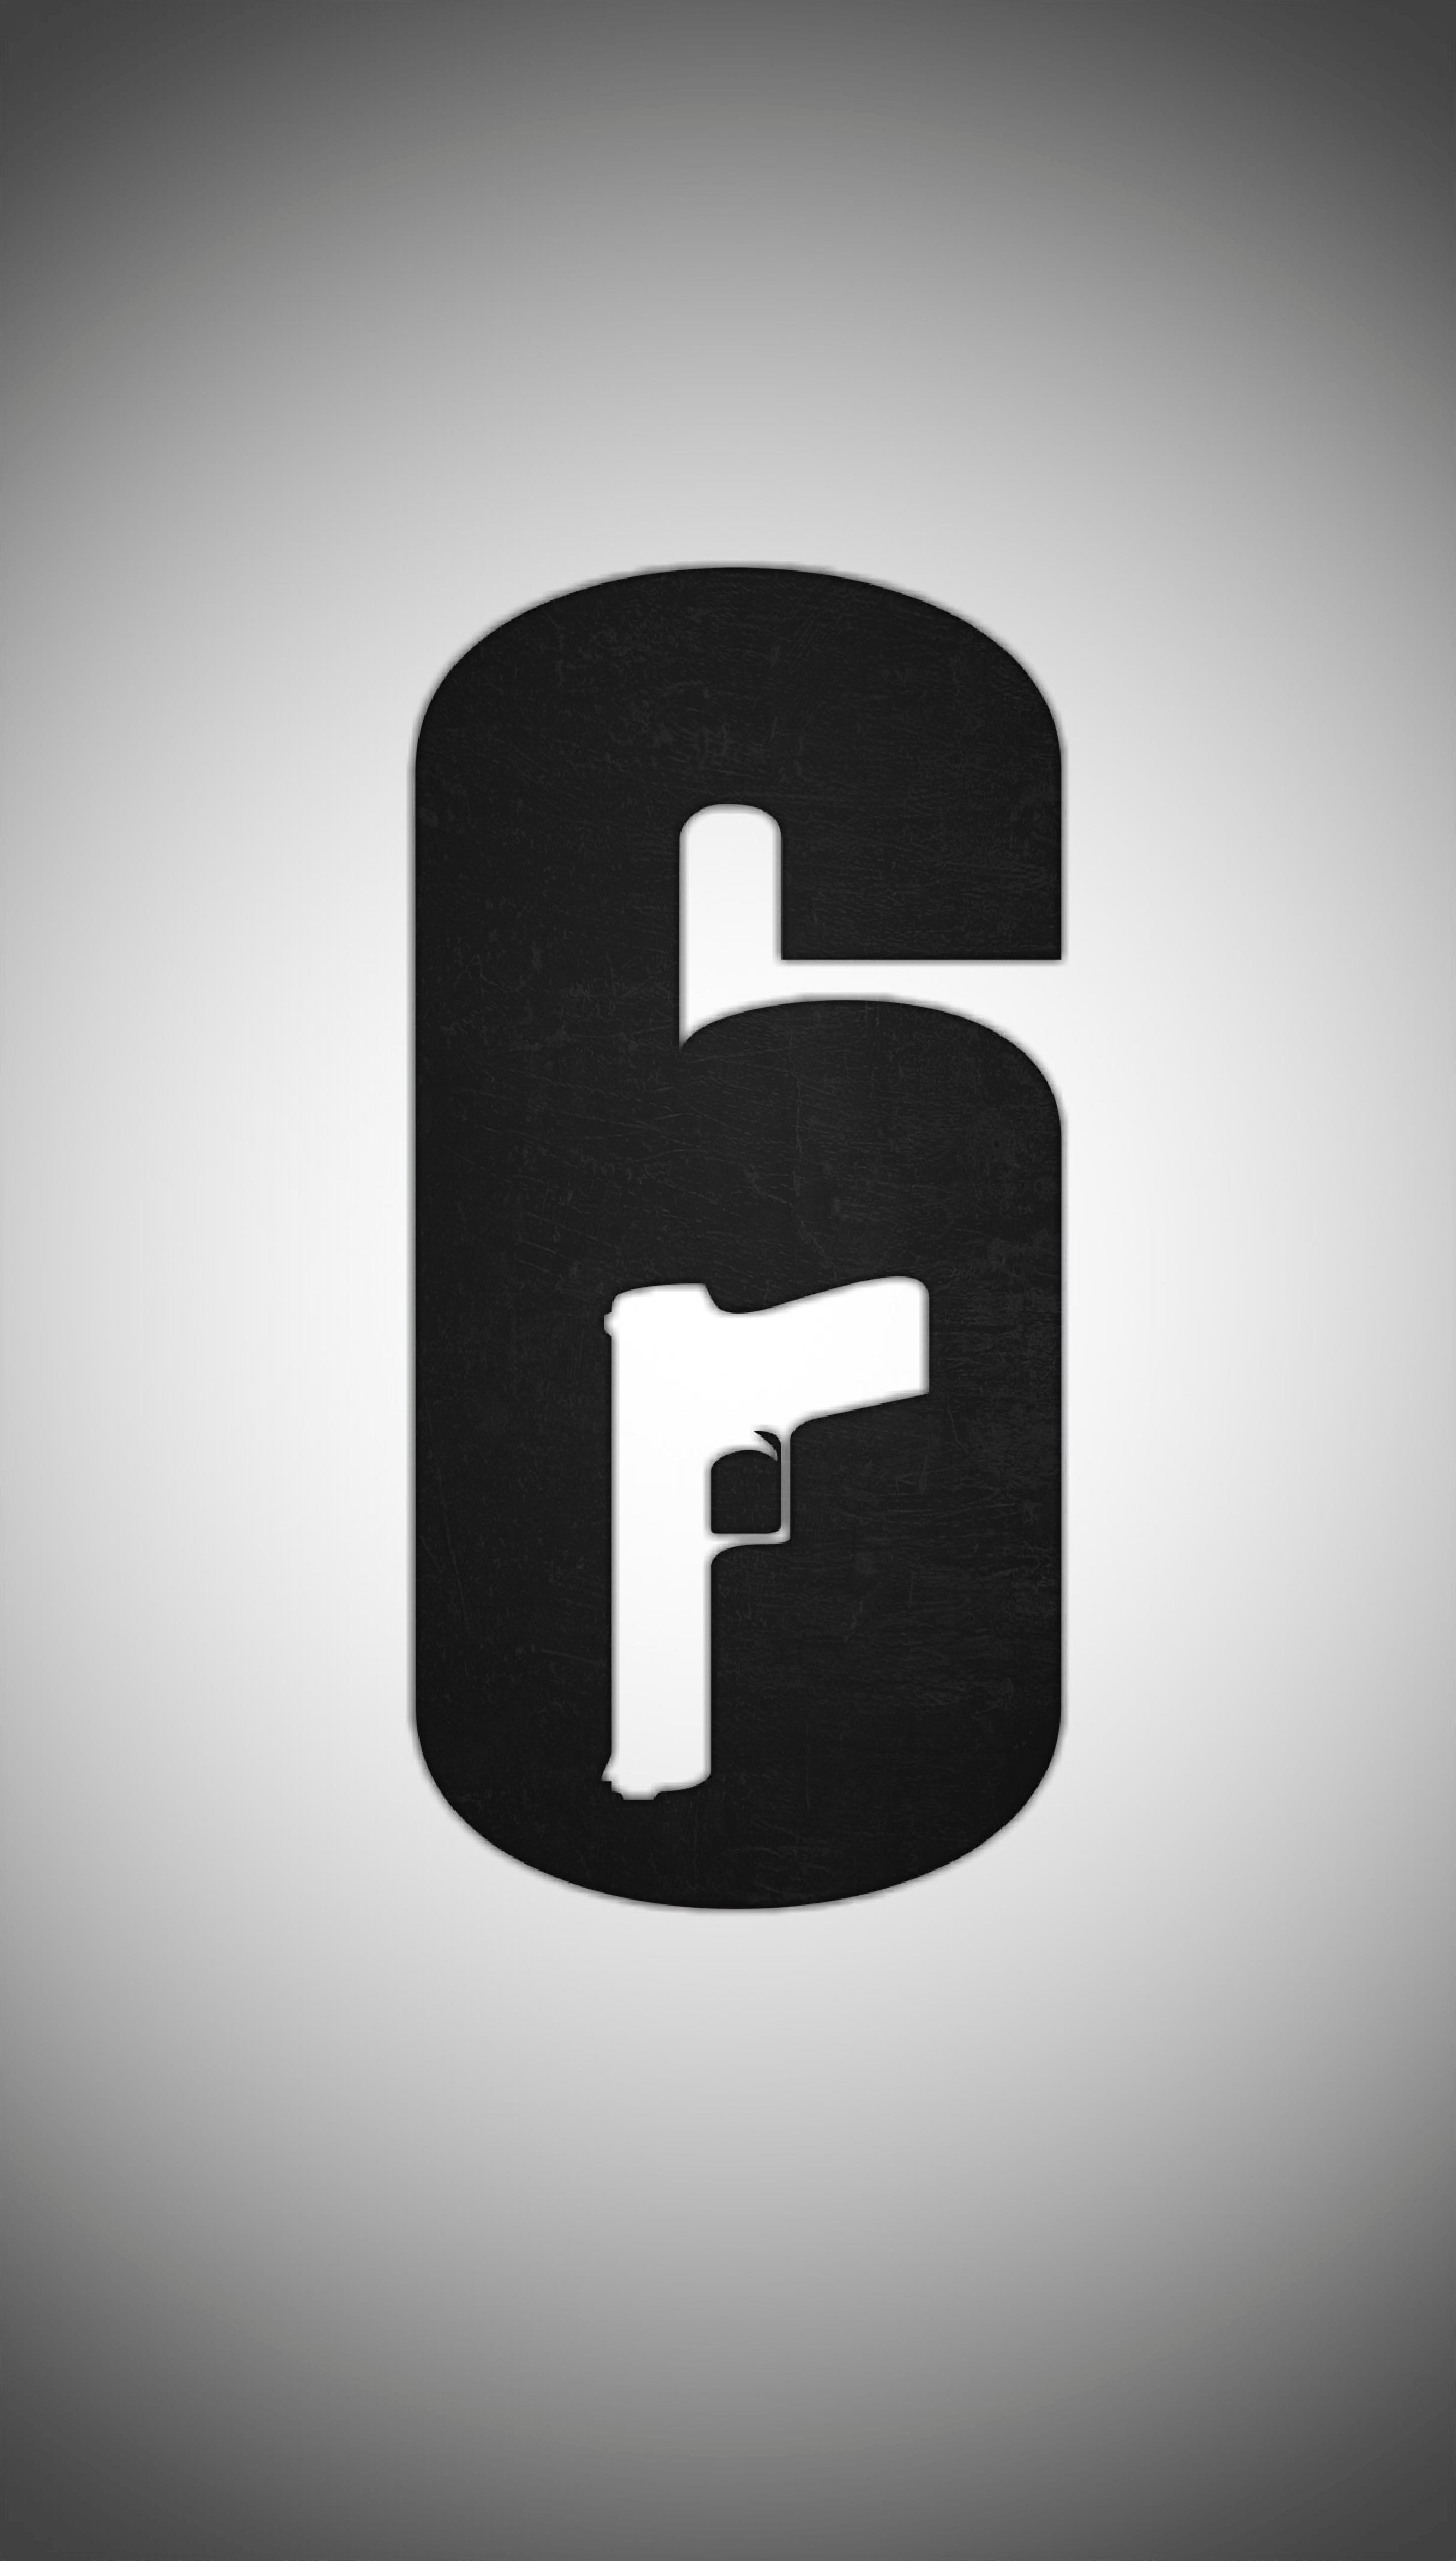 Rainbow Six Siege Logo Phone Wallpapers Wallpaper Cave